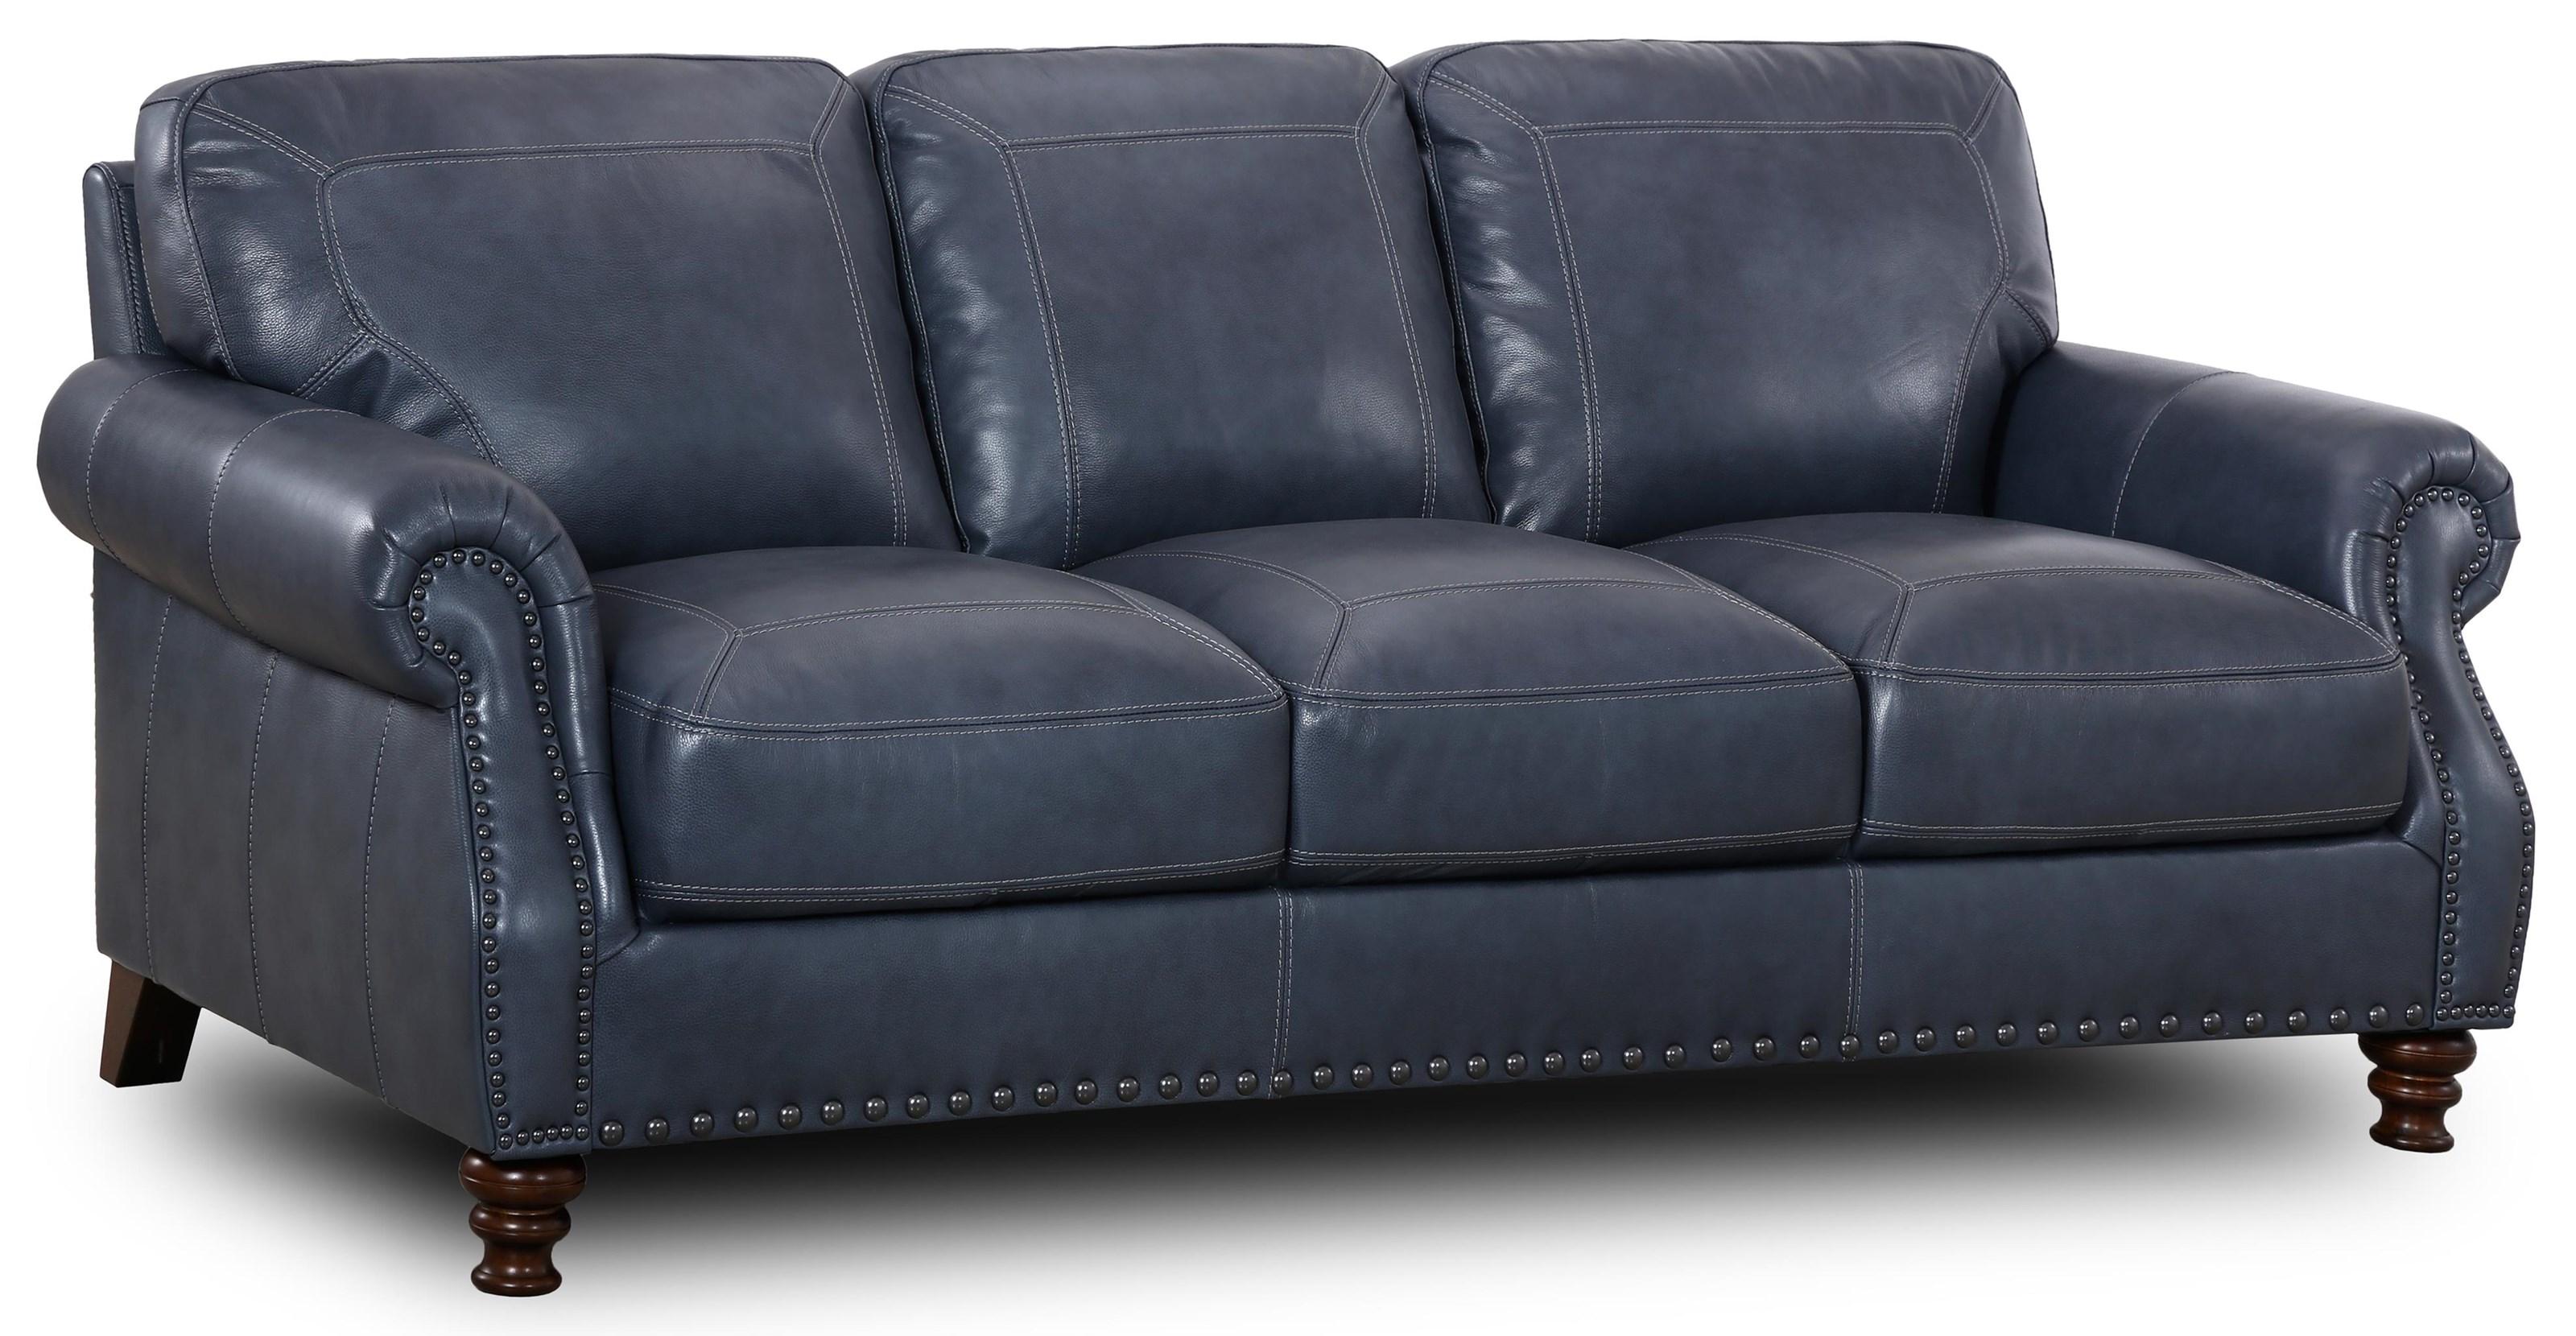 6978 Marine Marine Rolled Arm Sofa by Simon Li at Furniture Fair - North Carolina